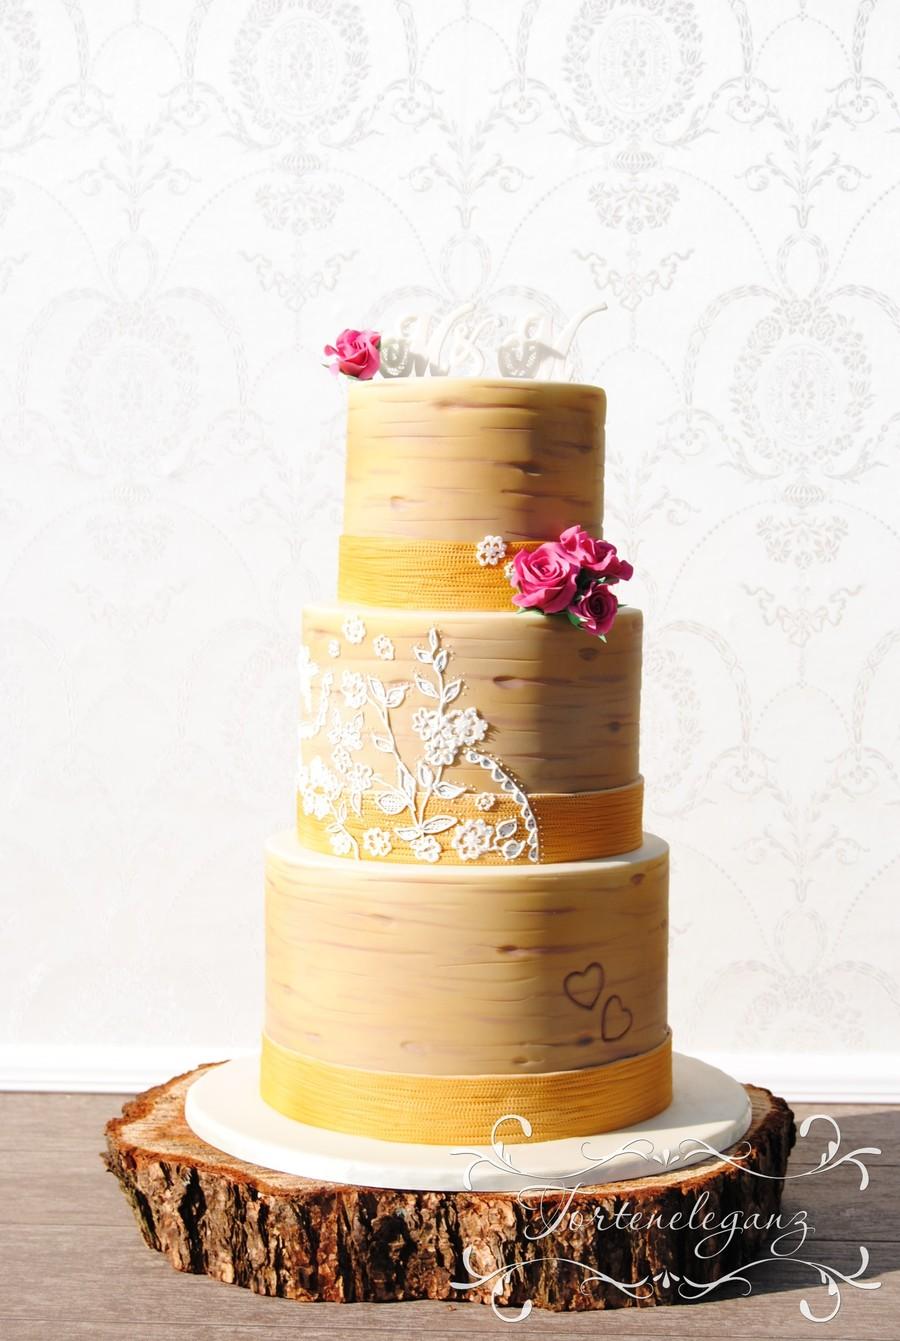 Rustic Wedding - Custom Lace On A Birch Cake With Burlap Ribbon ...